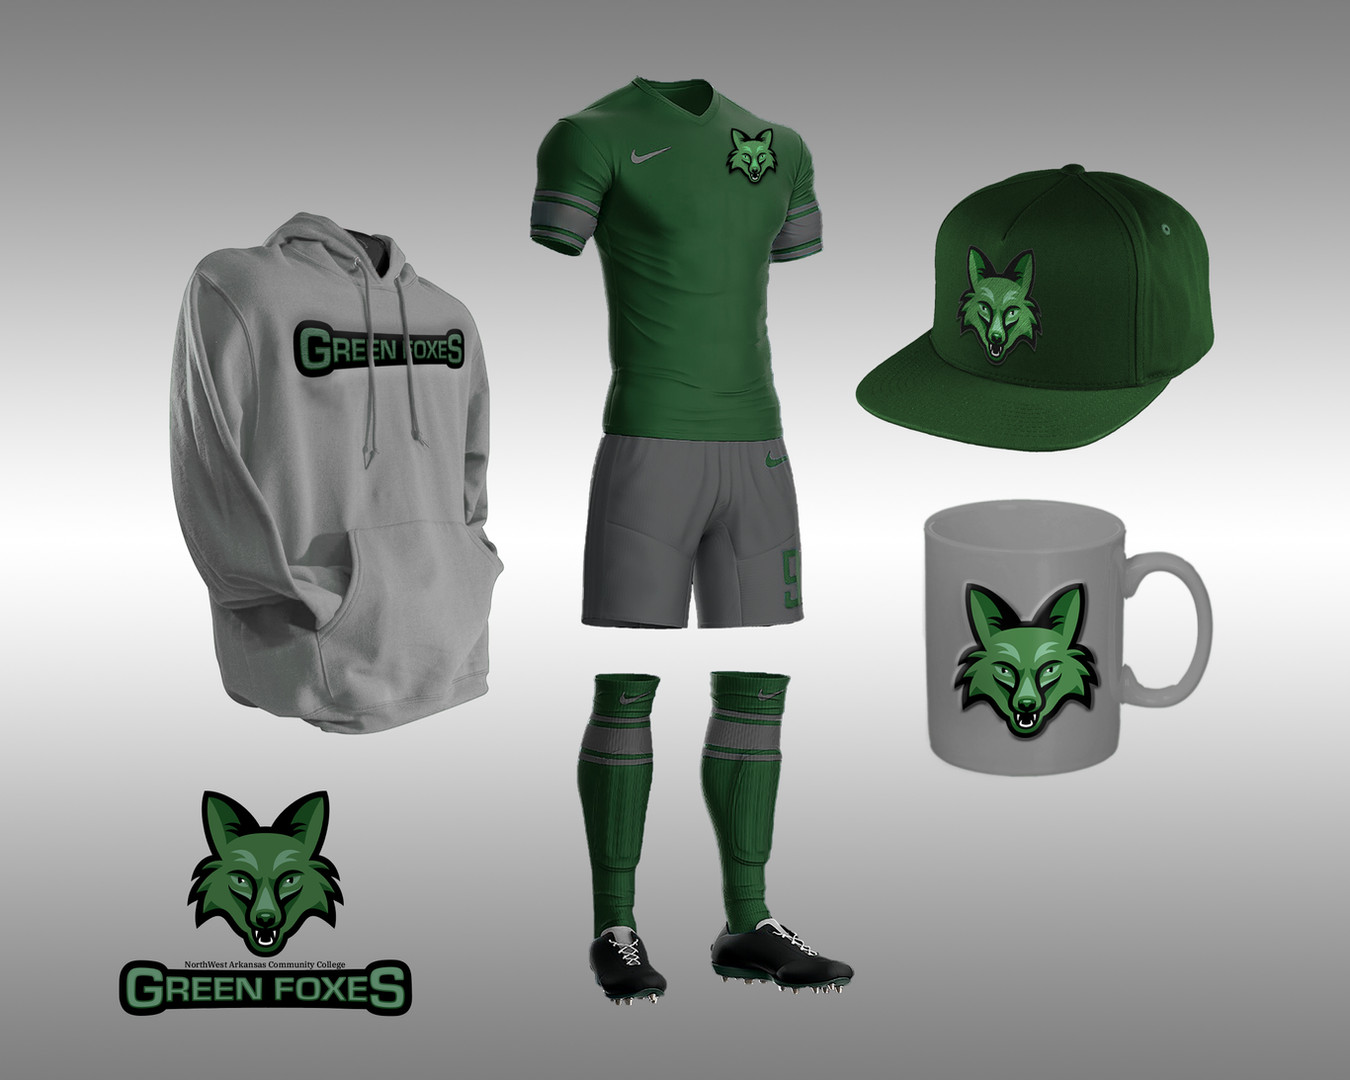 Green Foxes Mascot